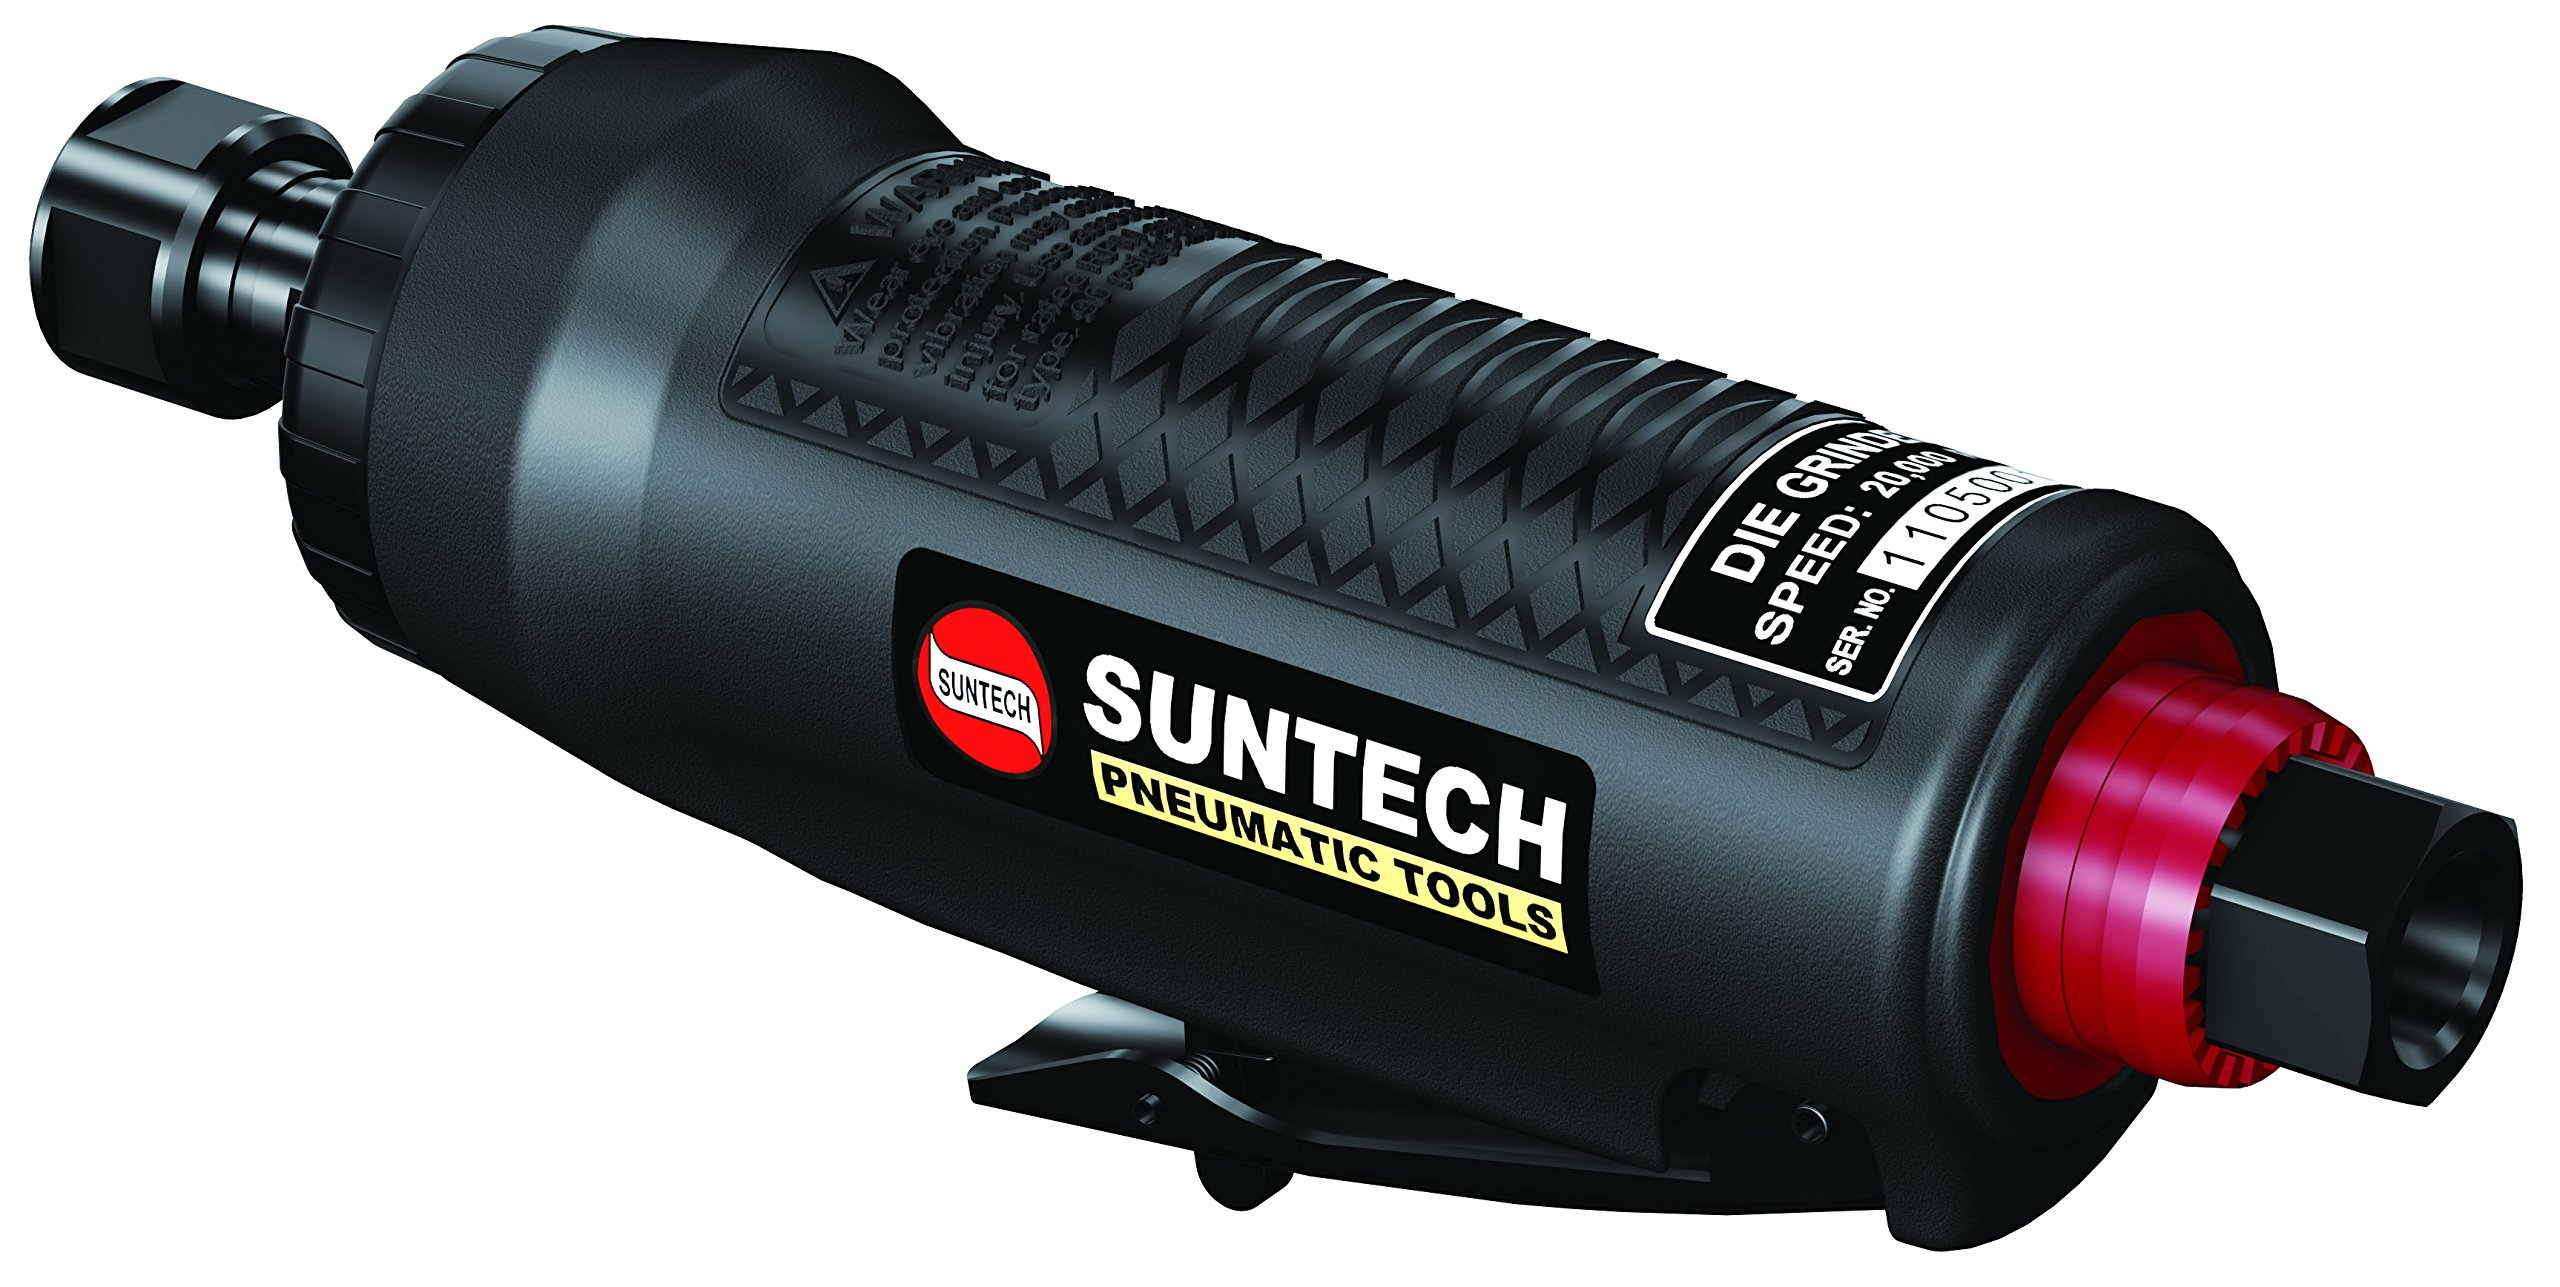 SUNTECH SM-51-5100 Sunmatch Power Die Grinders, Black